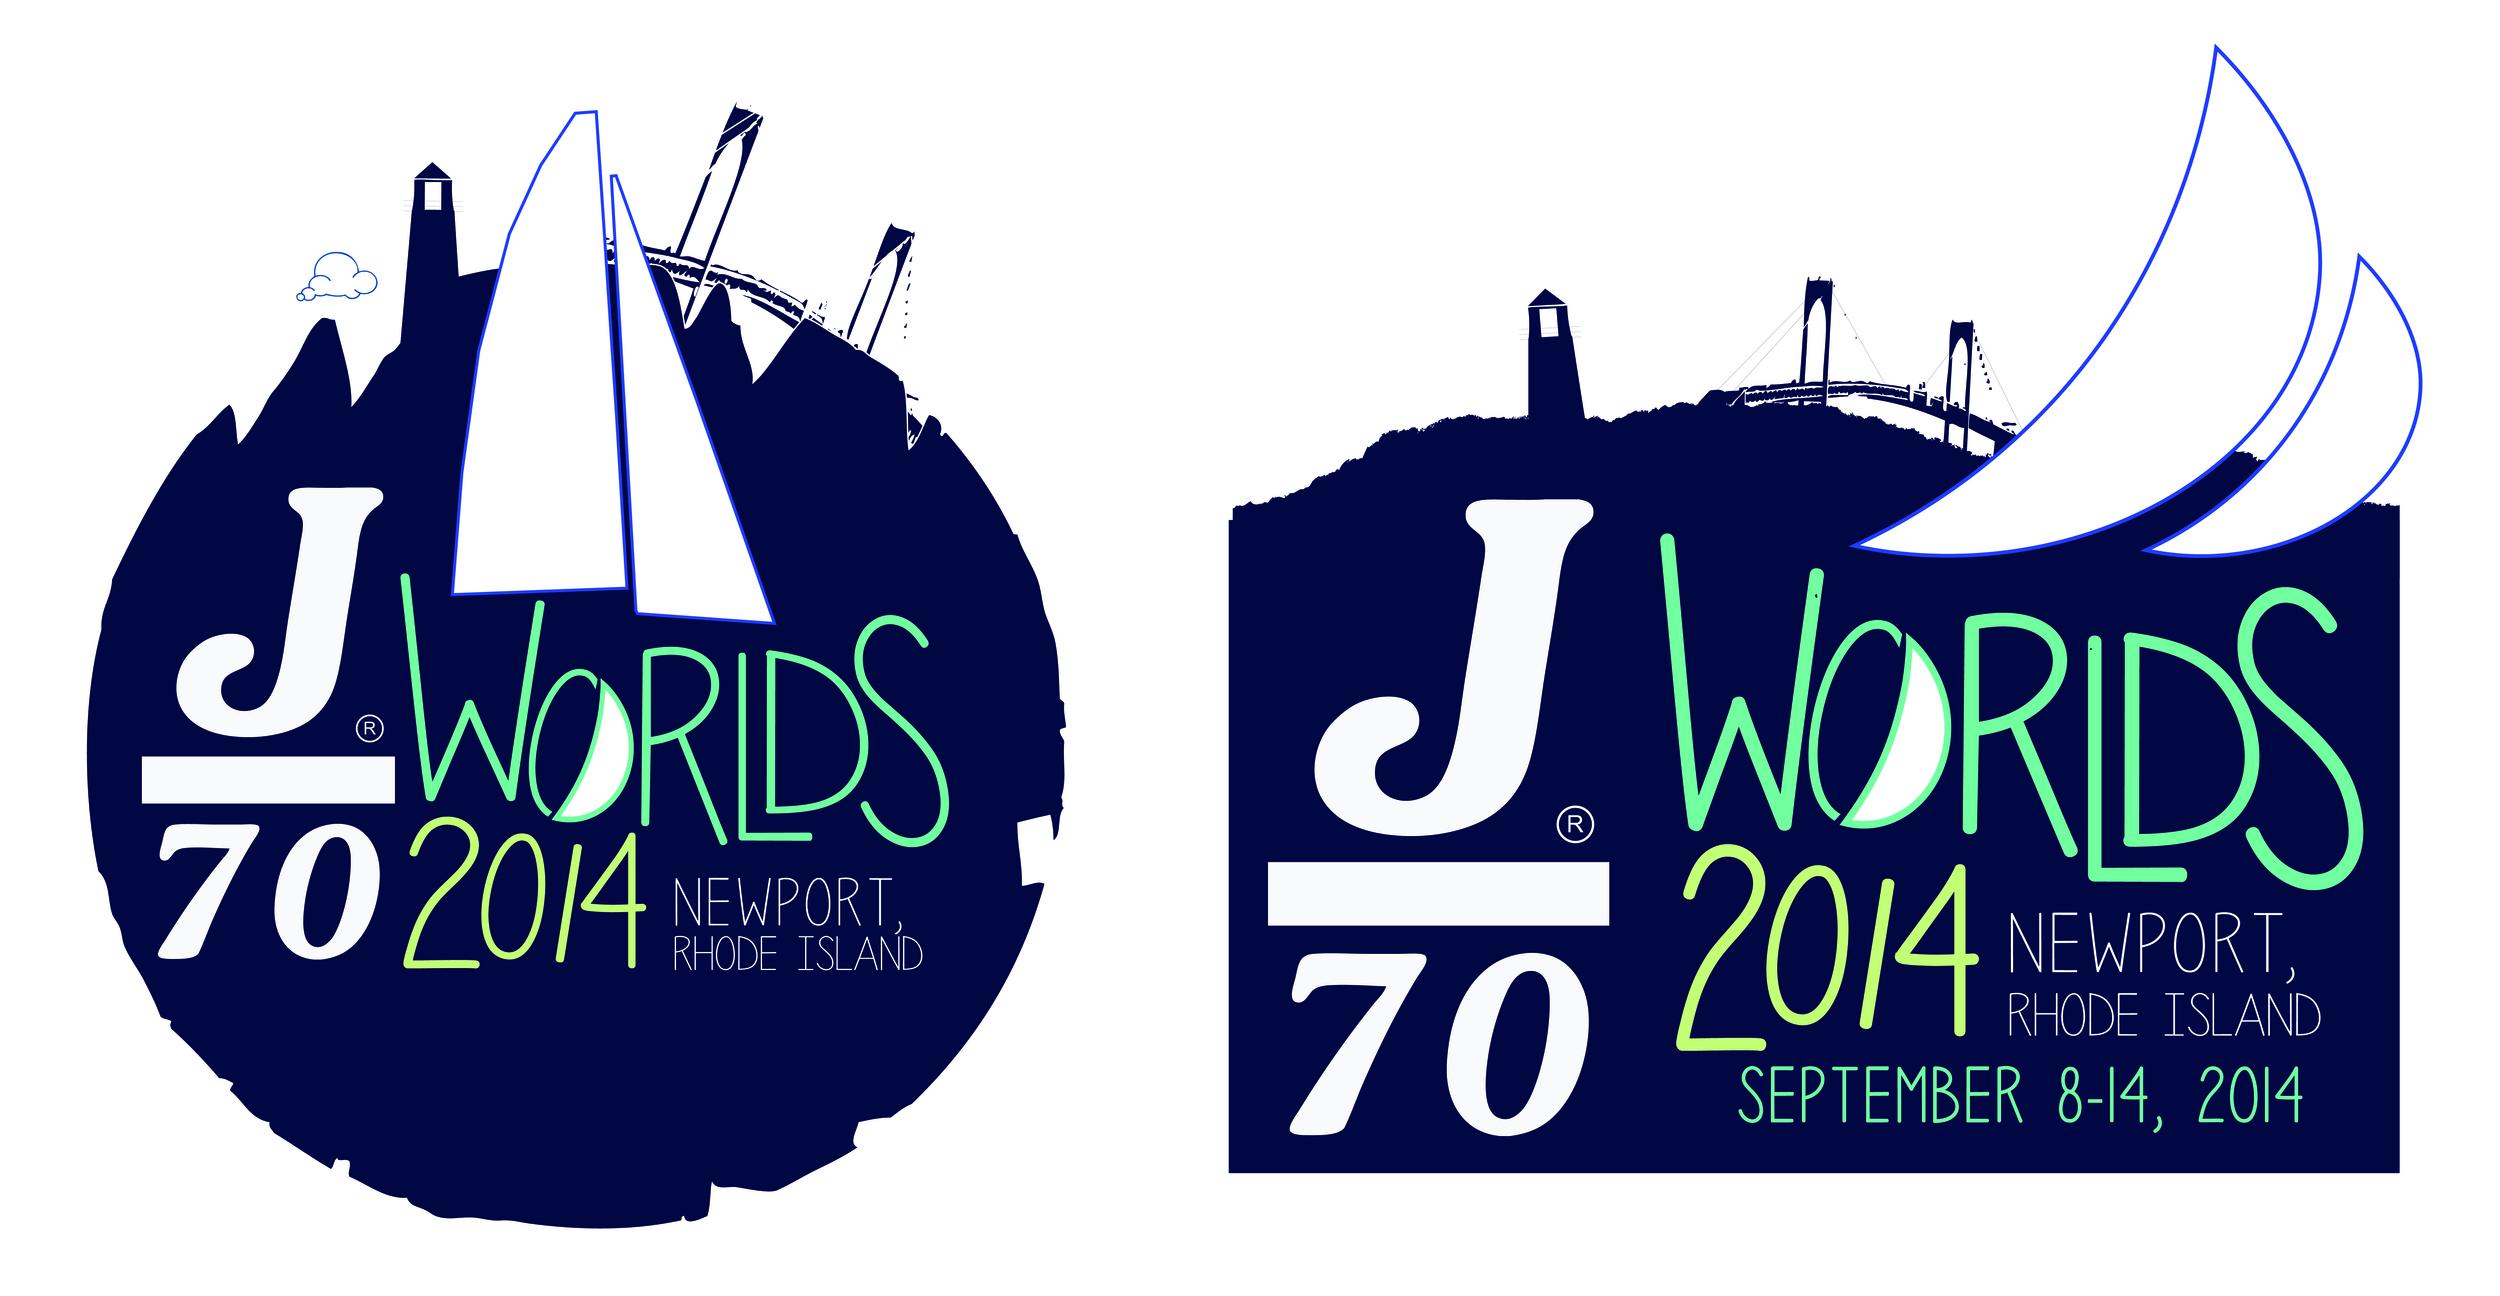 J70WORLDS01-01.jpg